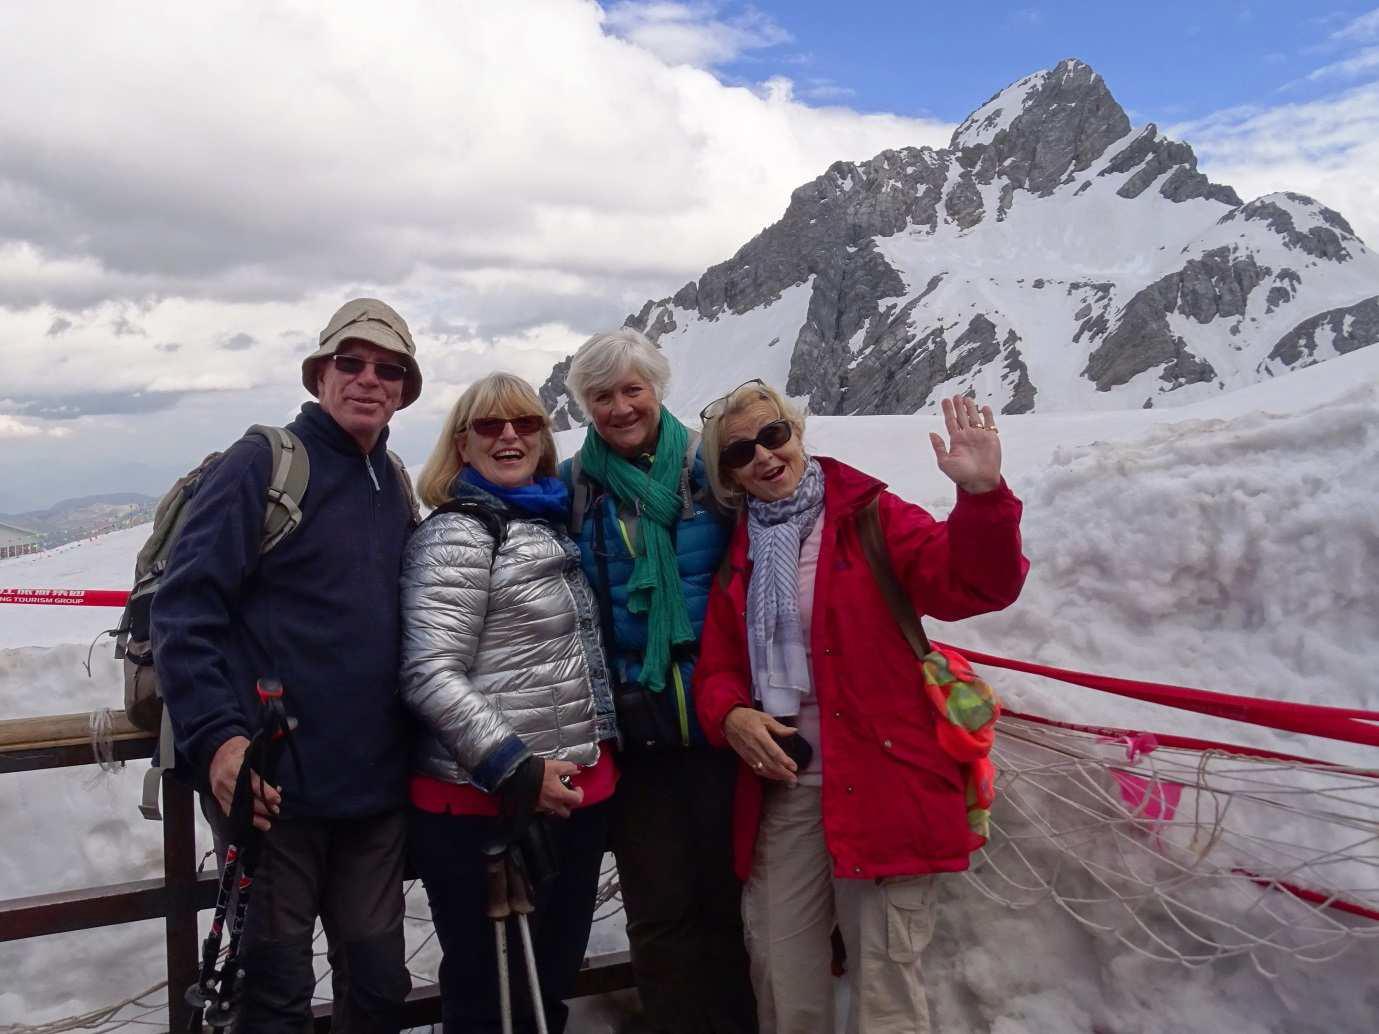 Groupe STEUNOU / LEROY-MULLER – Voyage Yunnan en liberté (13 jours)